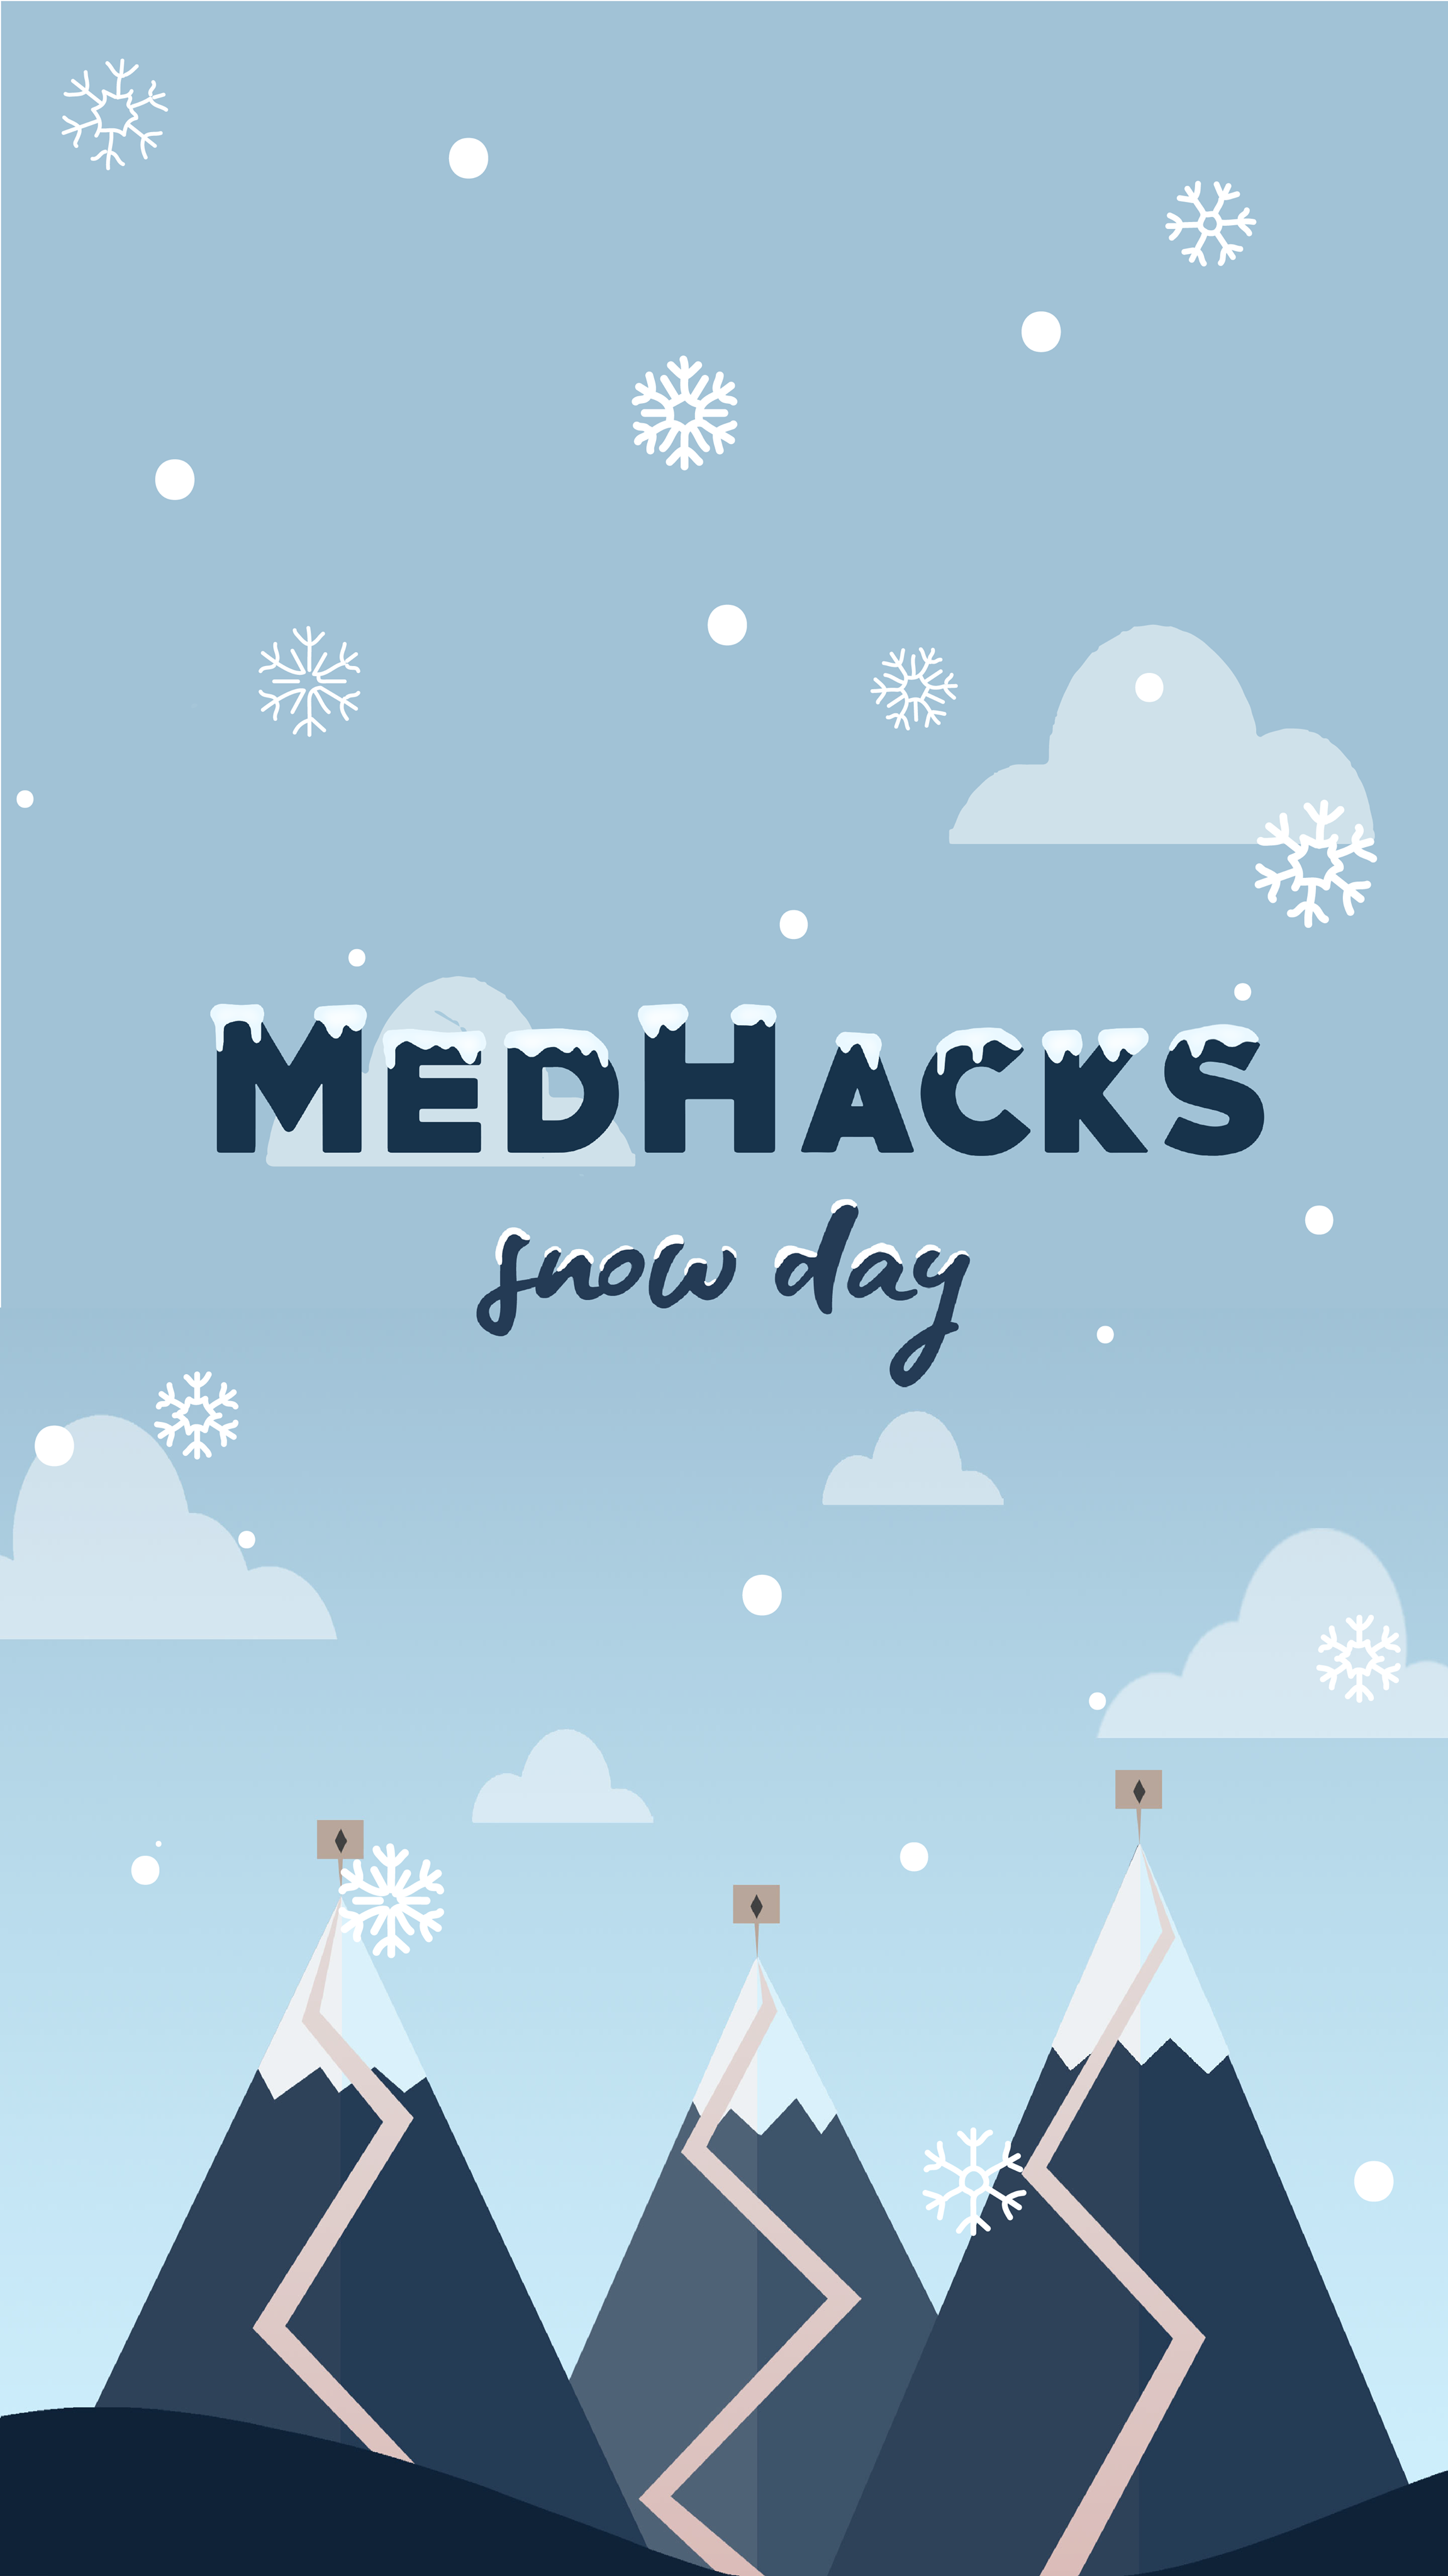 MedHacks 2018: Snow Day